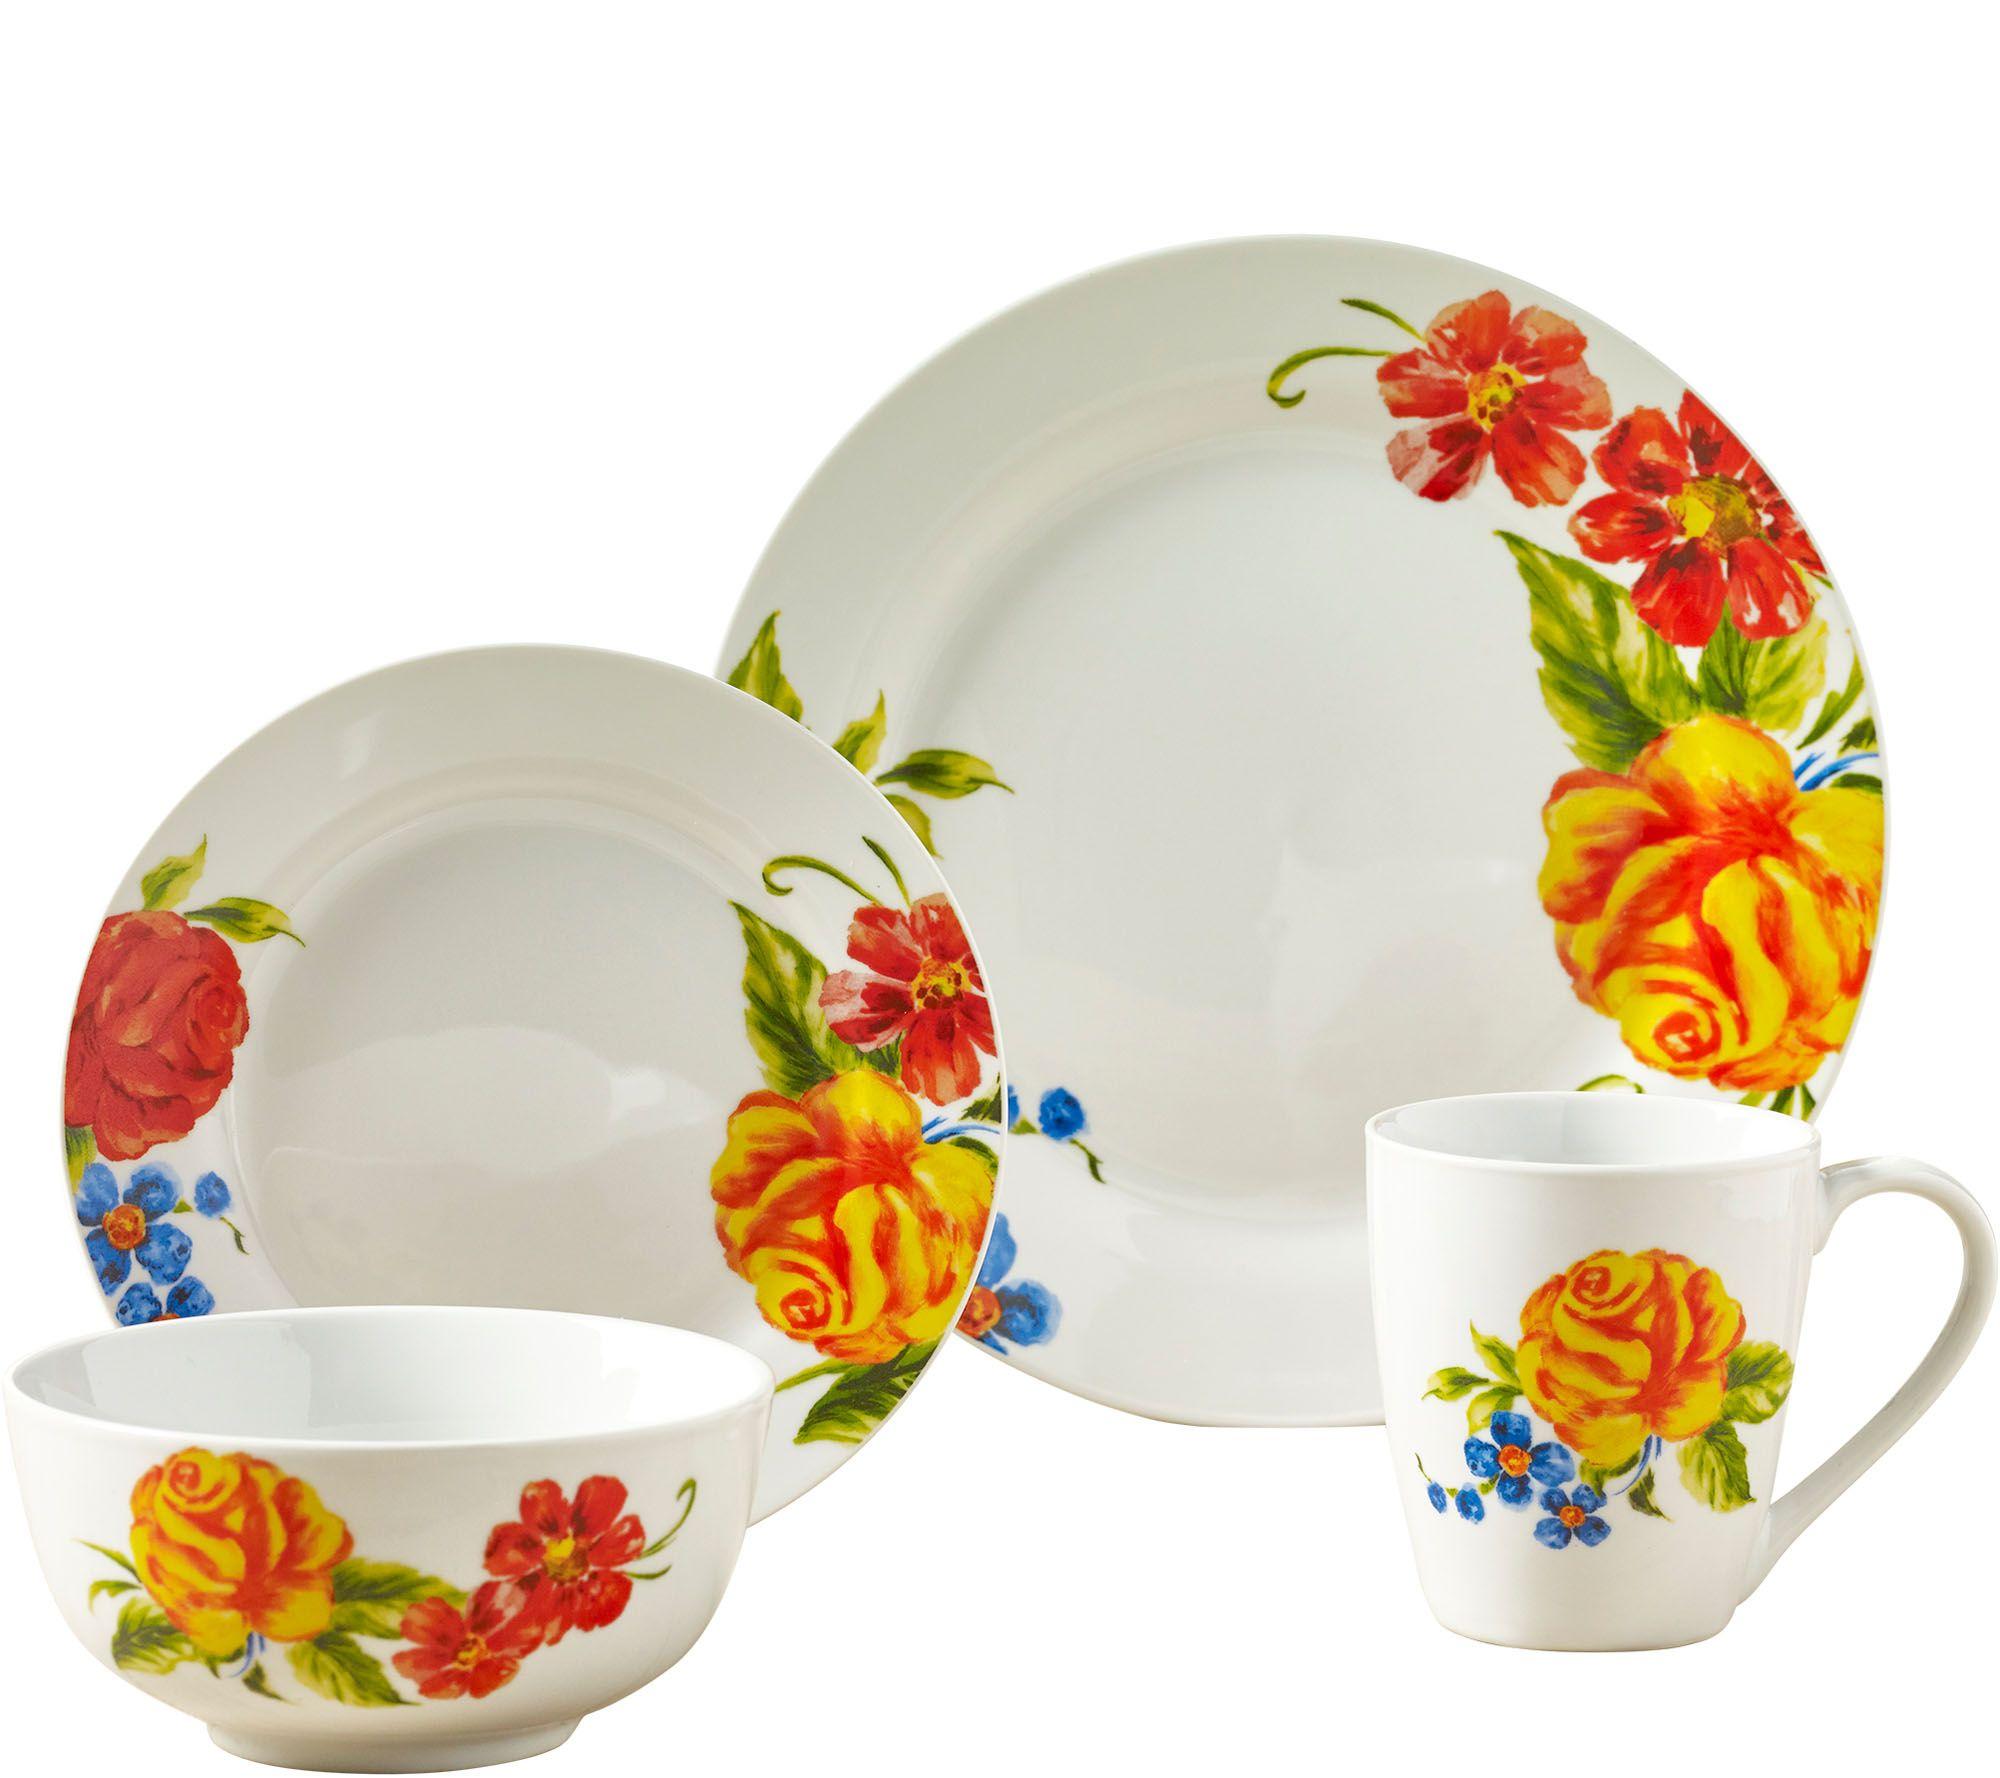 sc 1 st  QVC.com & Tabletops Gallery 16-Piece Dinnerware Set - Grace u2014 QVC.com